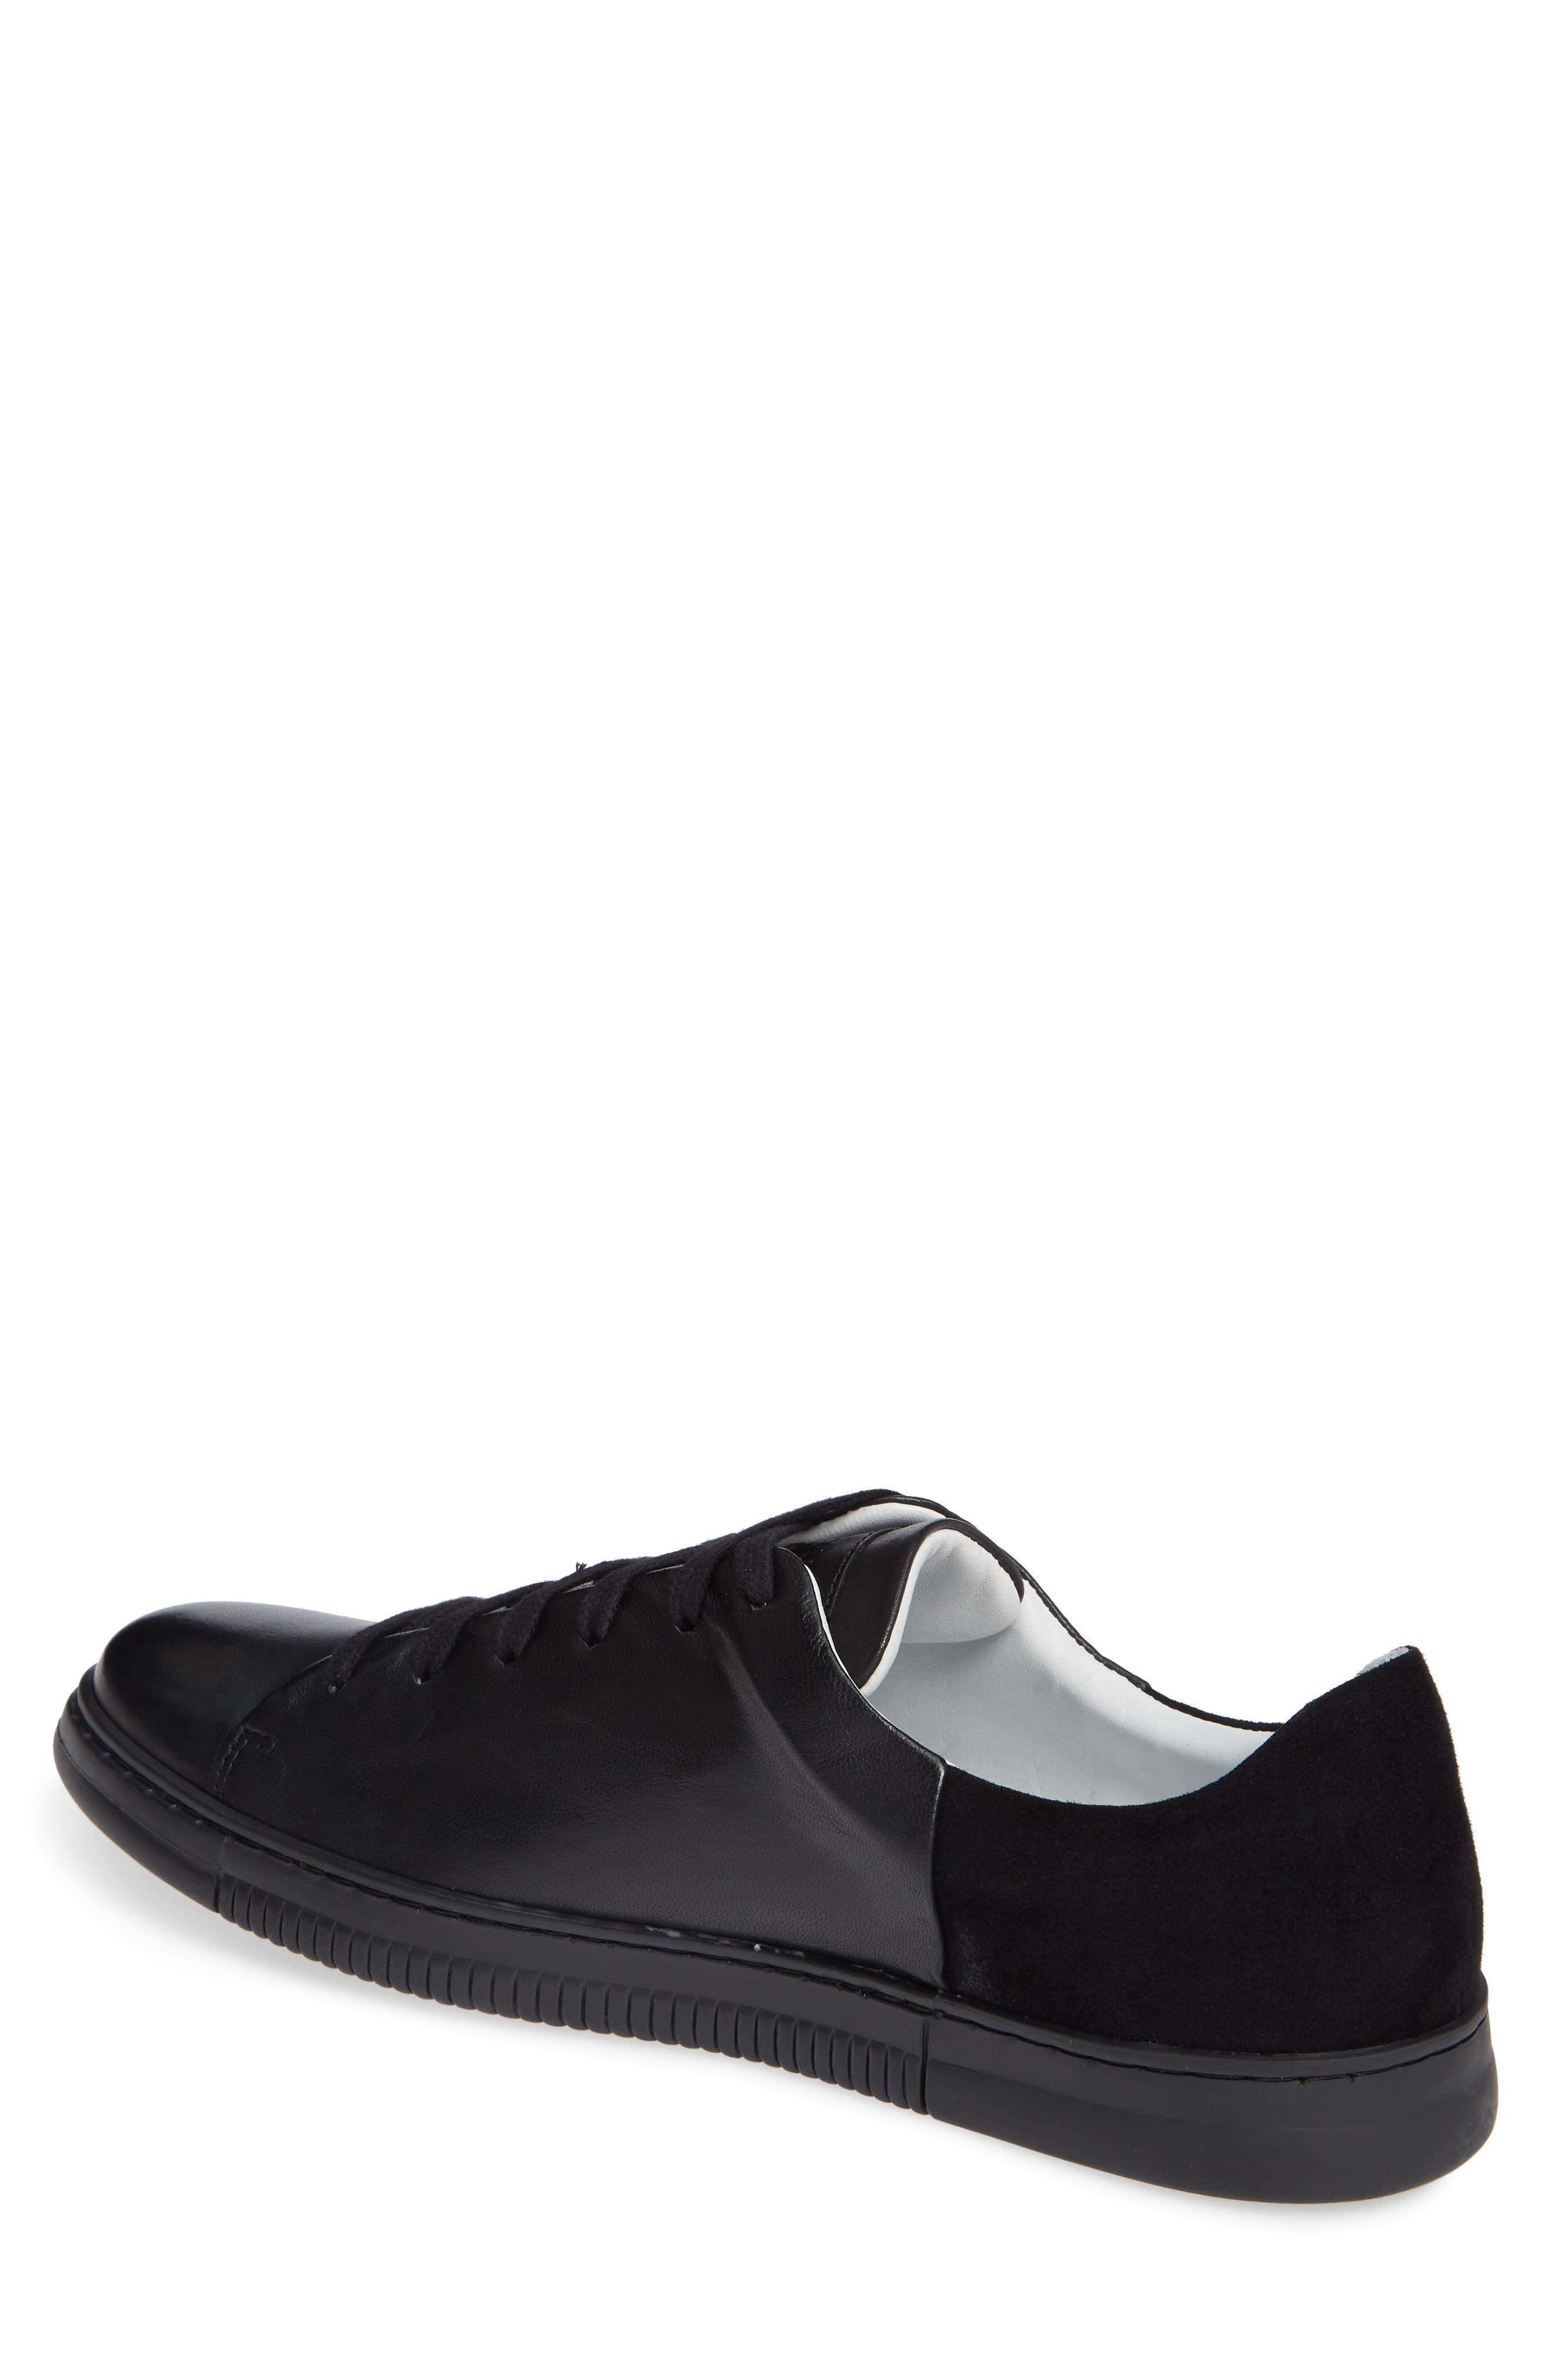 VINCE CAMUTO,                             Jito Sneaker,                             Alternate thumbnail 2, color,                             BLACK LEATHER